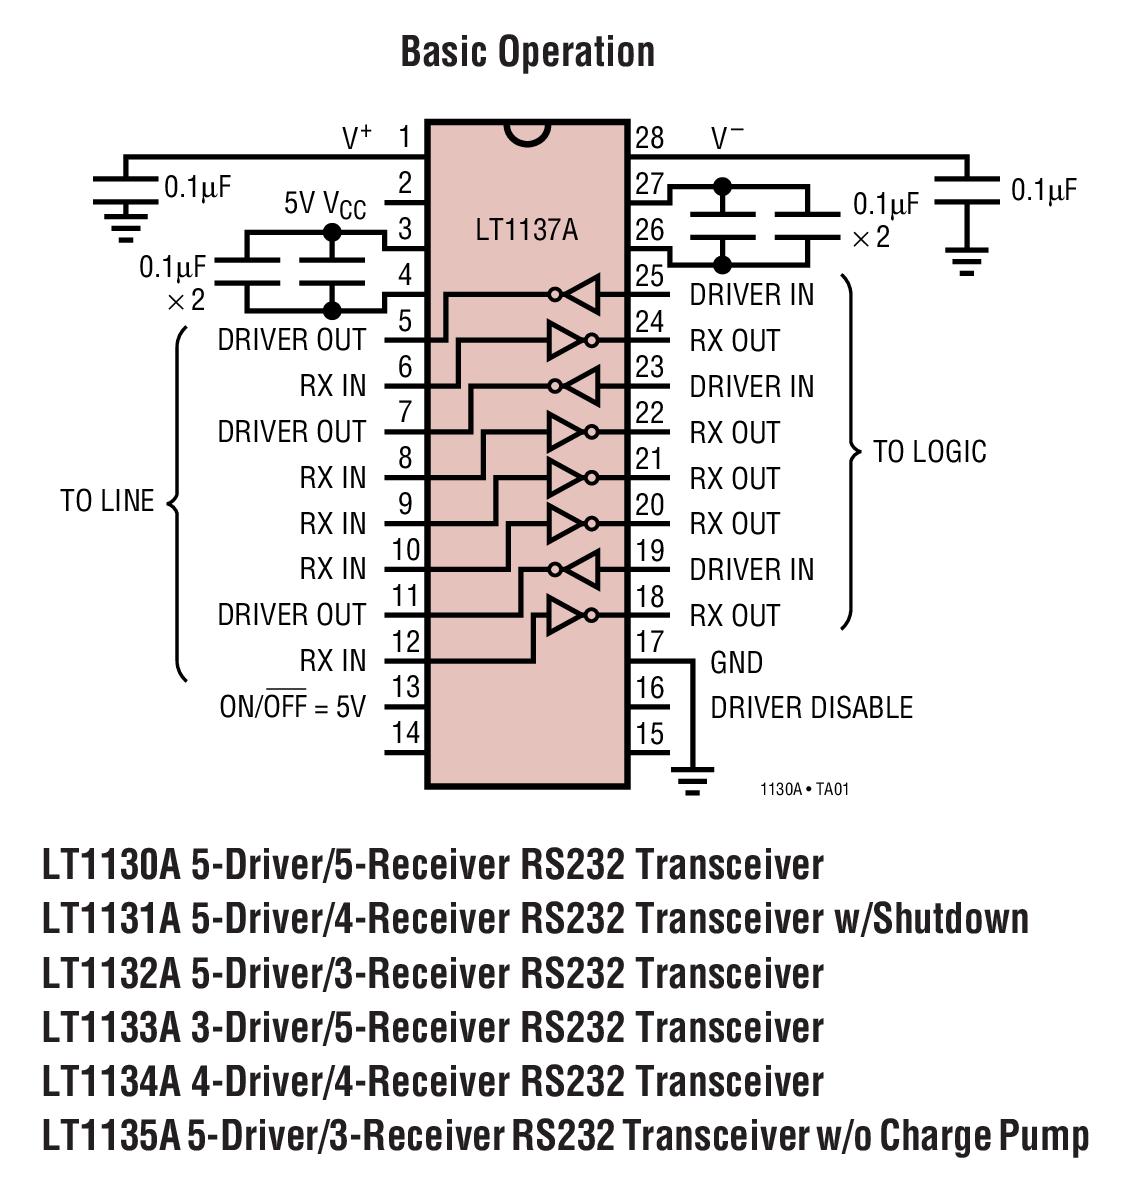 LT1139A 采用小電容器的先進低功率 5V RS232 驅動器 / 接收器